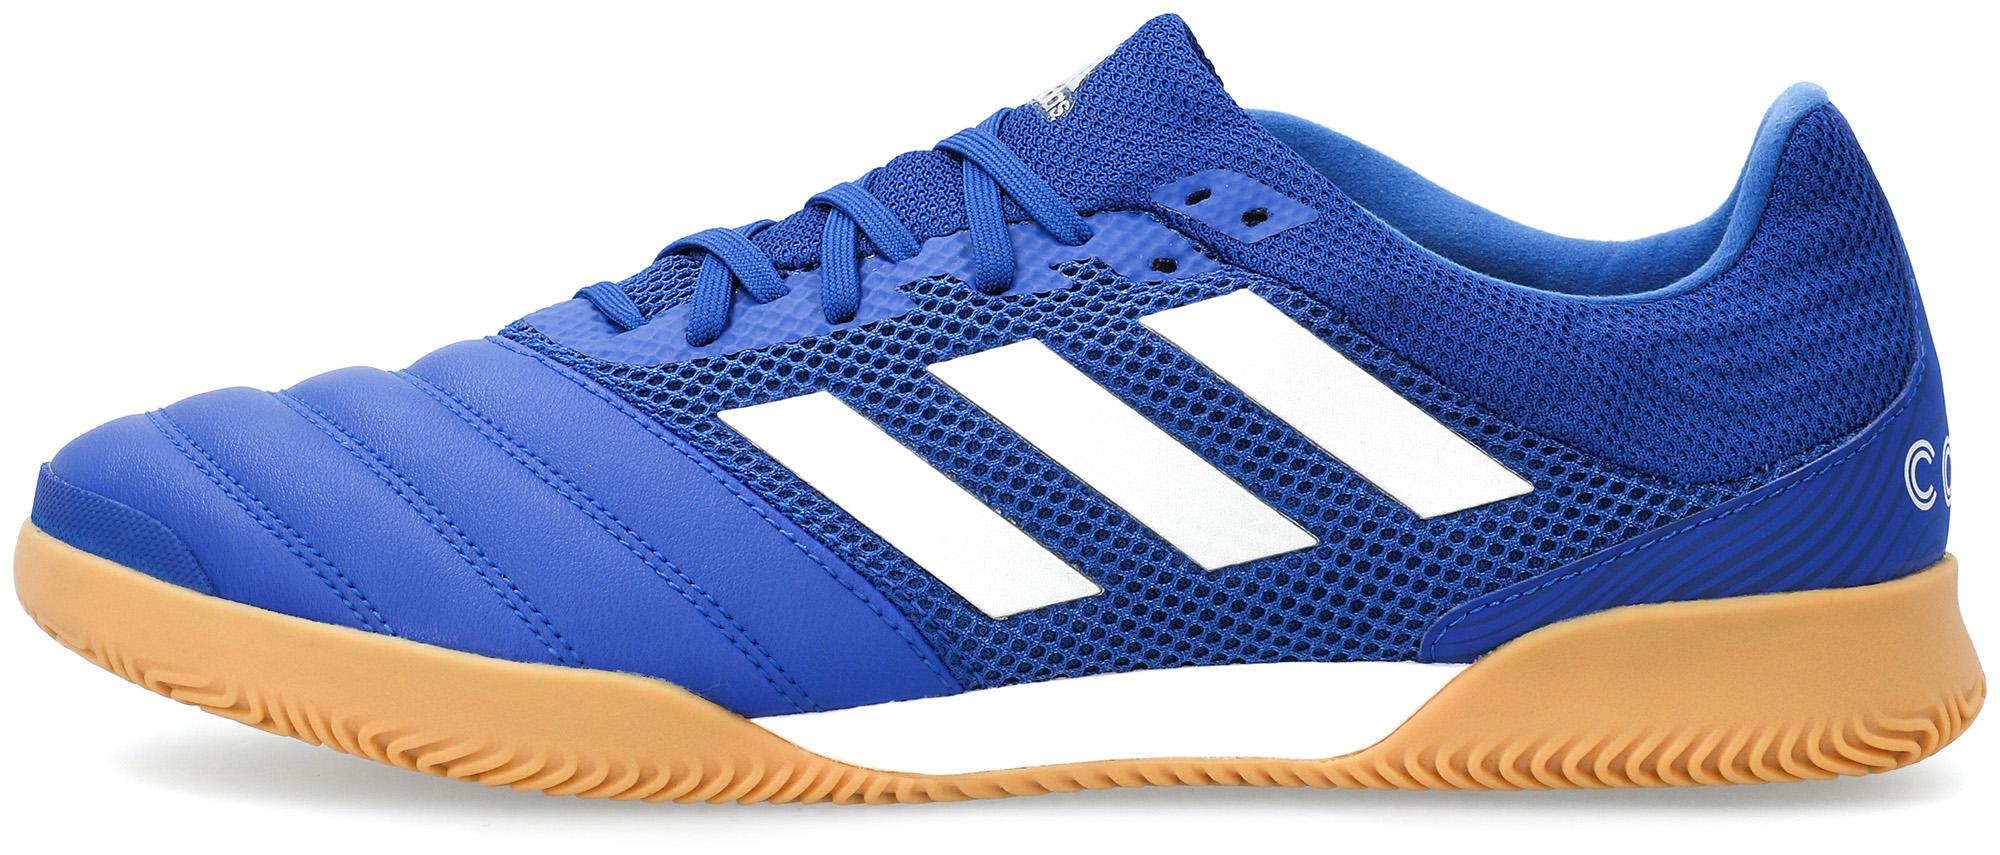 Бутсы мужские adidas Copa 20.3 IN Sala, размер 40.5 adidas бутсы для мальчиков adidas copa 20 3 fg j размер 37